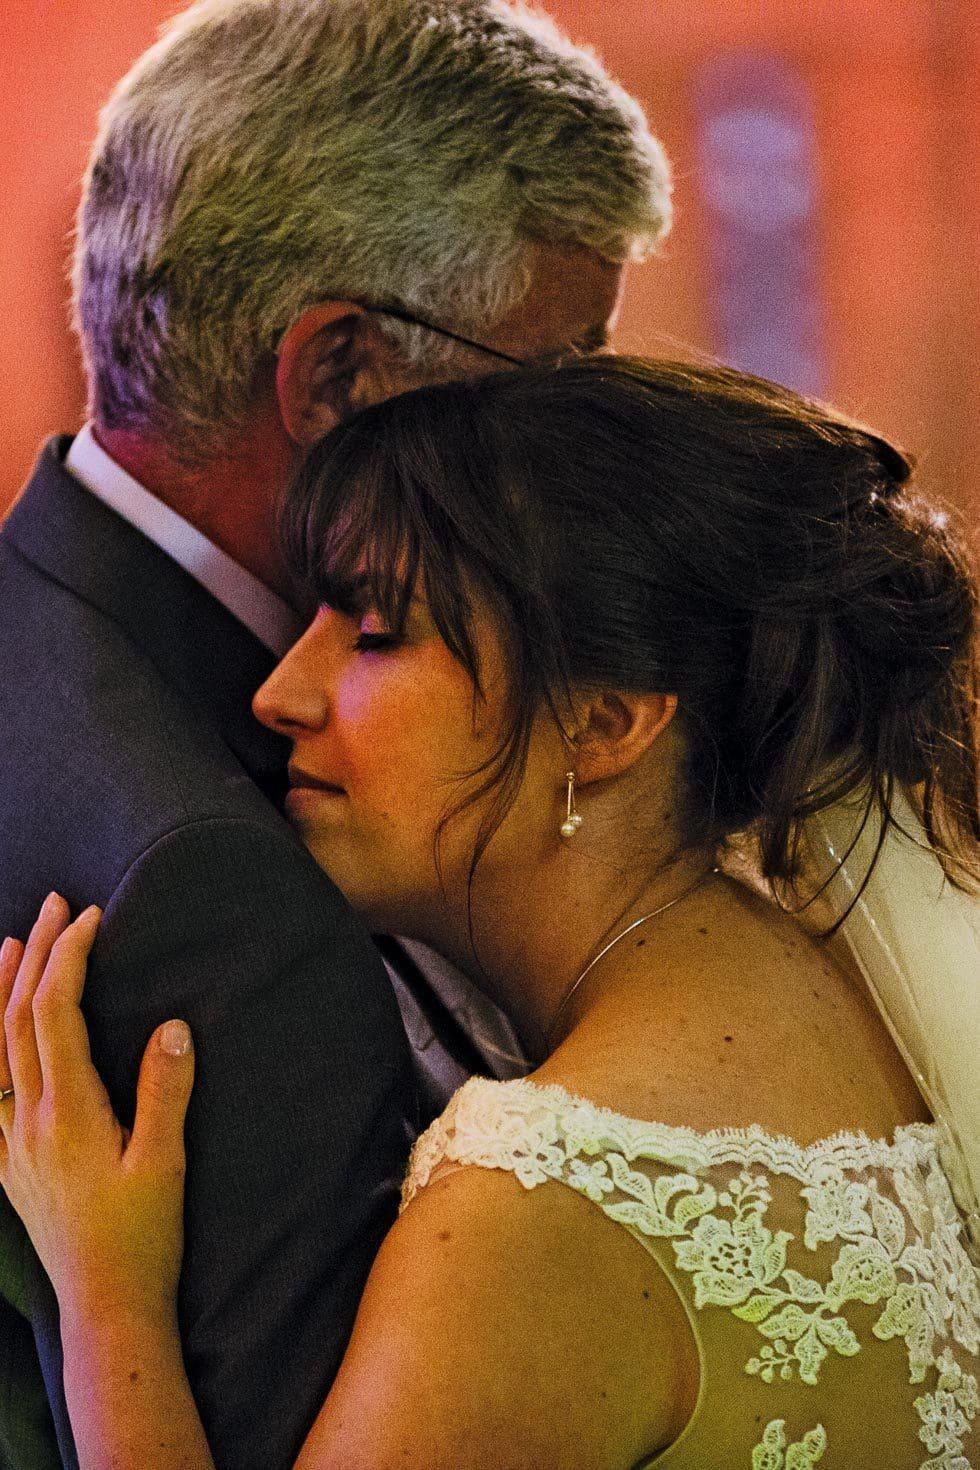 Vater Tochter Tanz Die Absolut Besten Songs Richtig Geniale Ideen